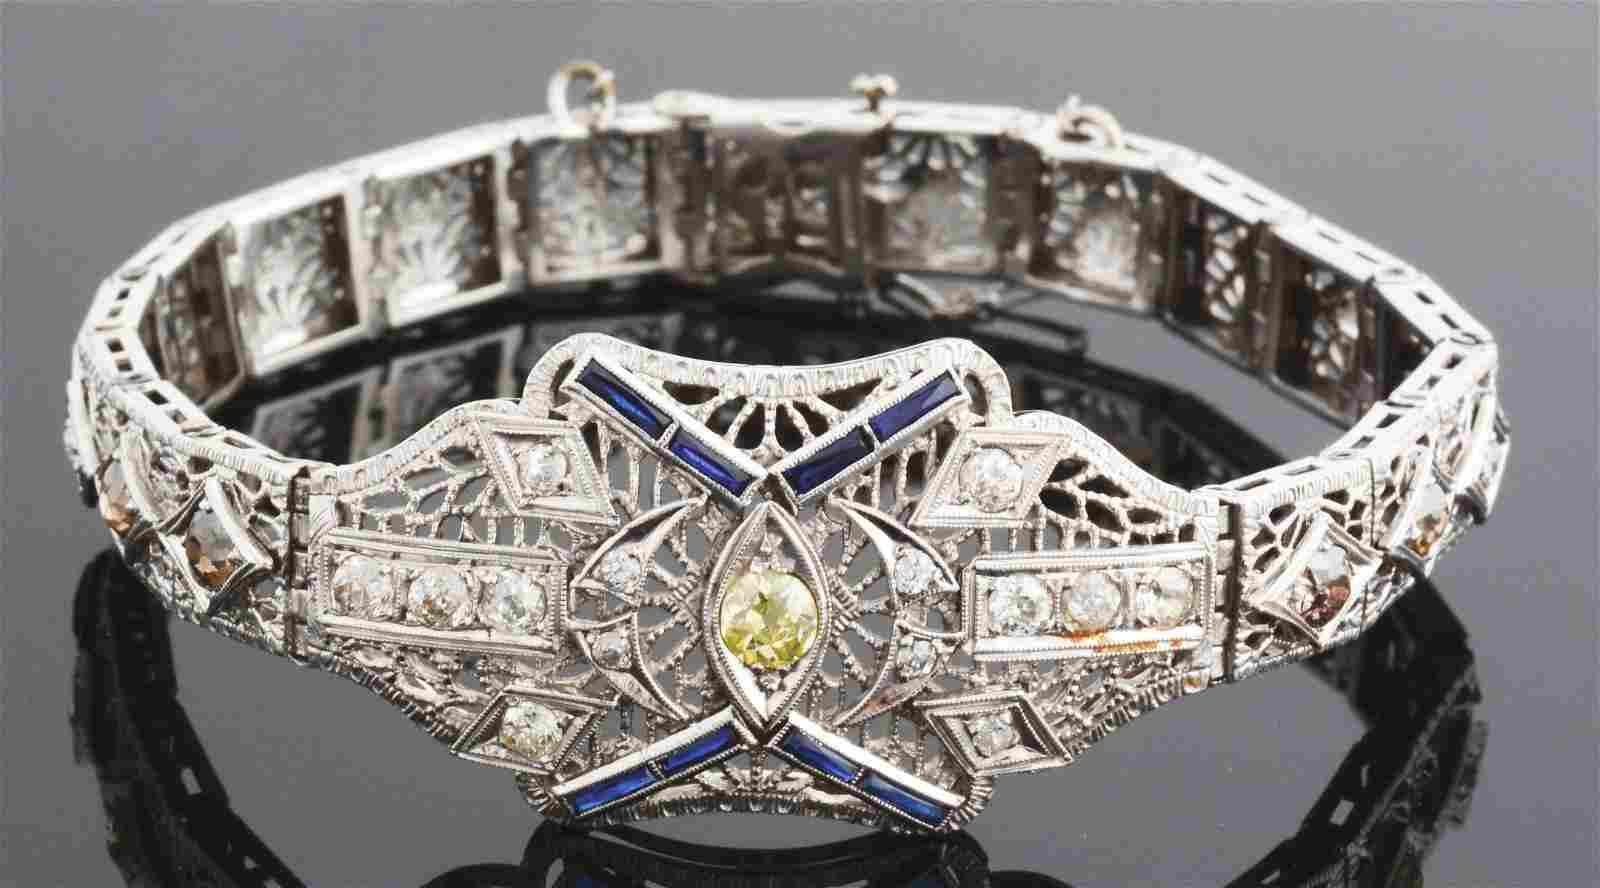 ANTIQUE 14K WHITE GOLD FILIGREE DIAMOND & SAPPHIRE